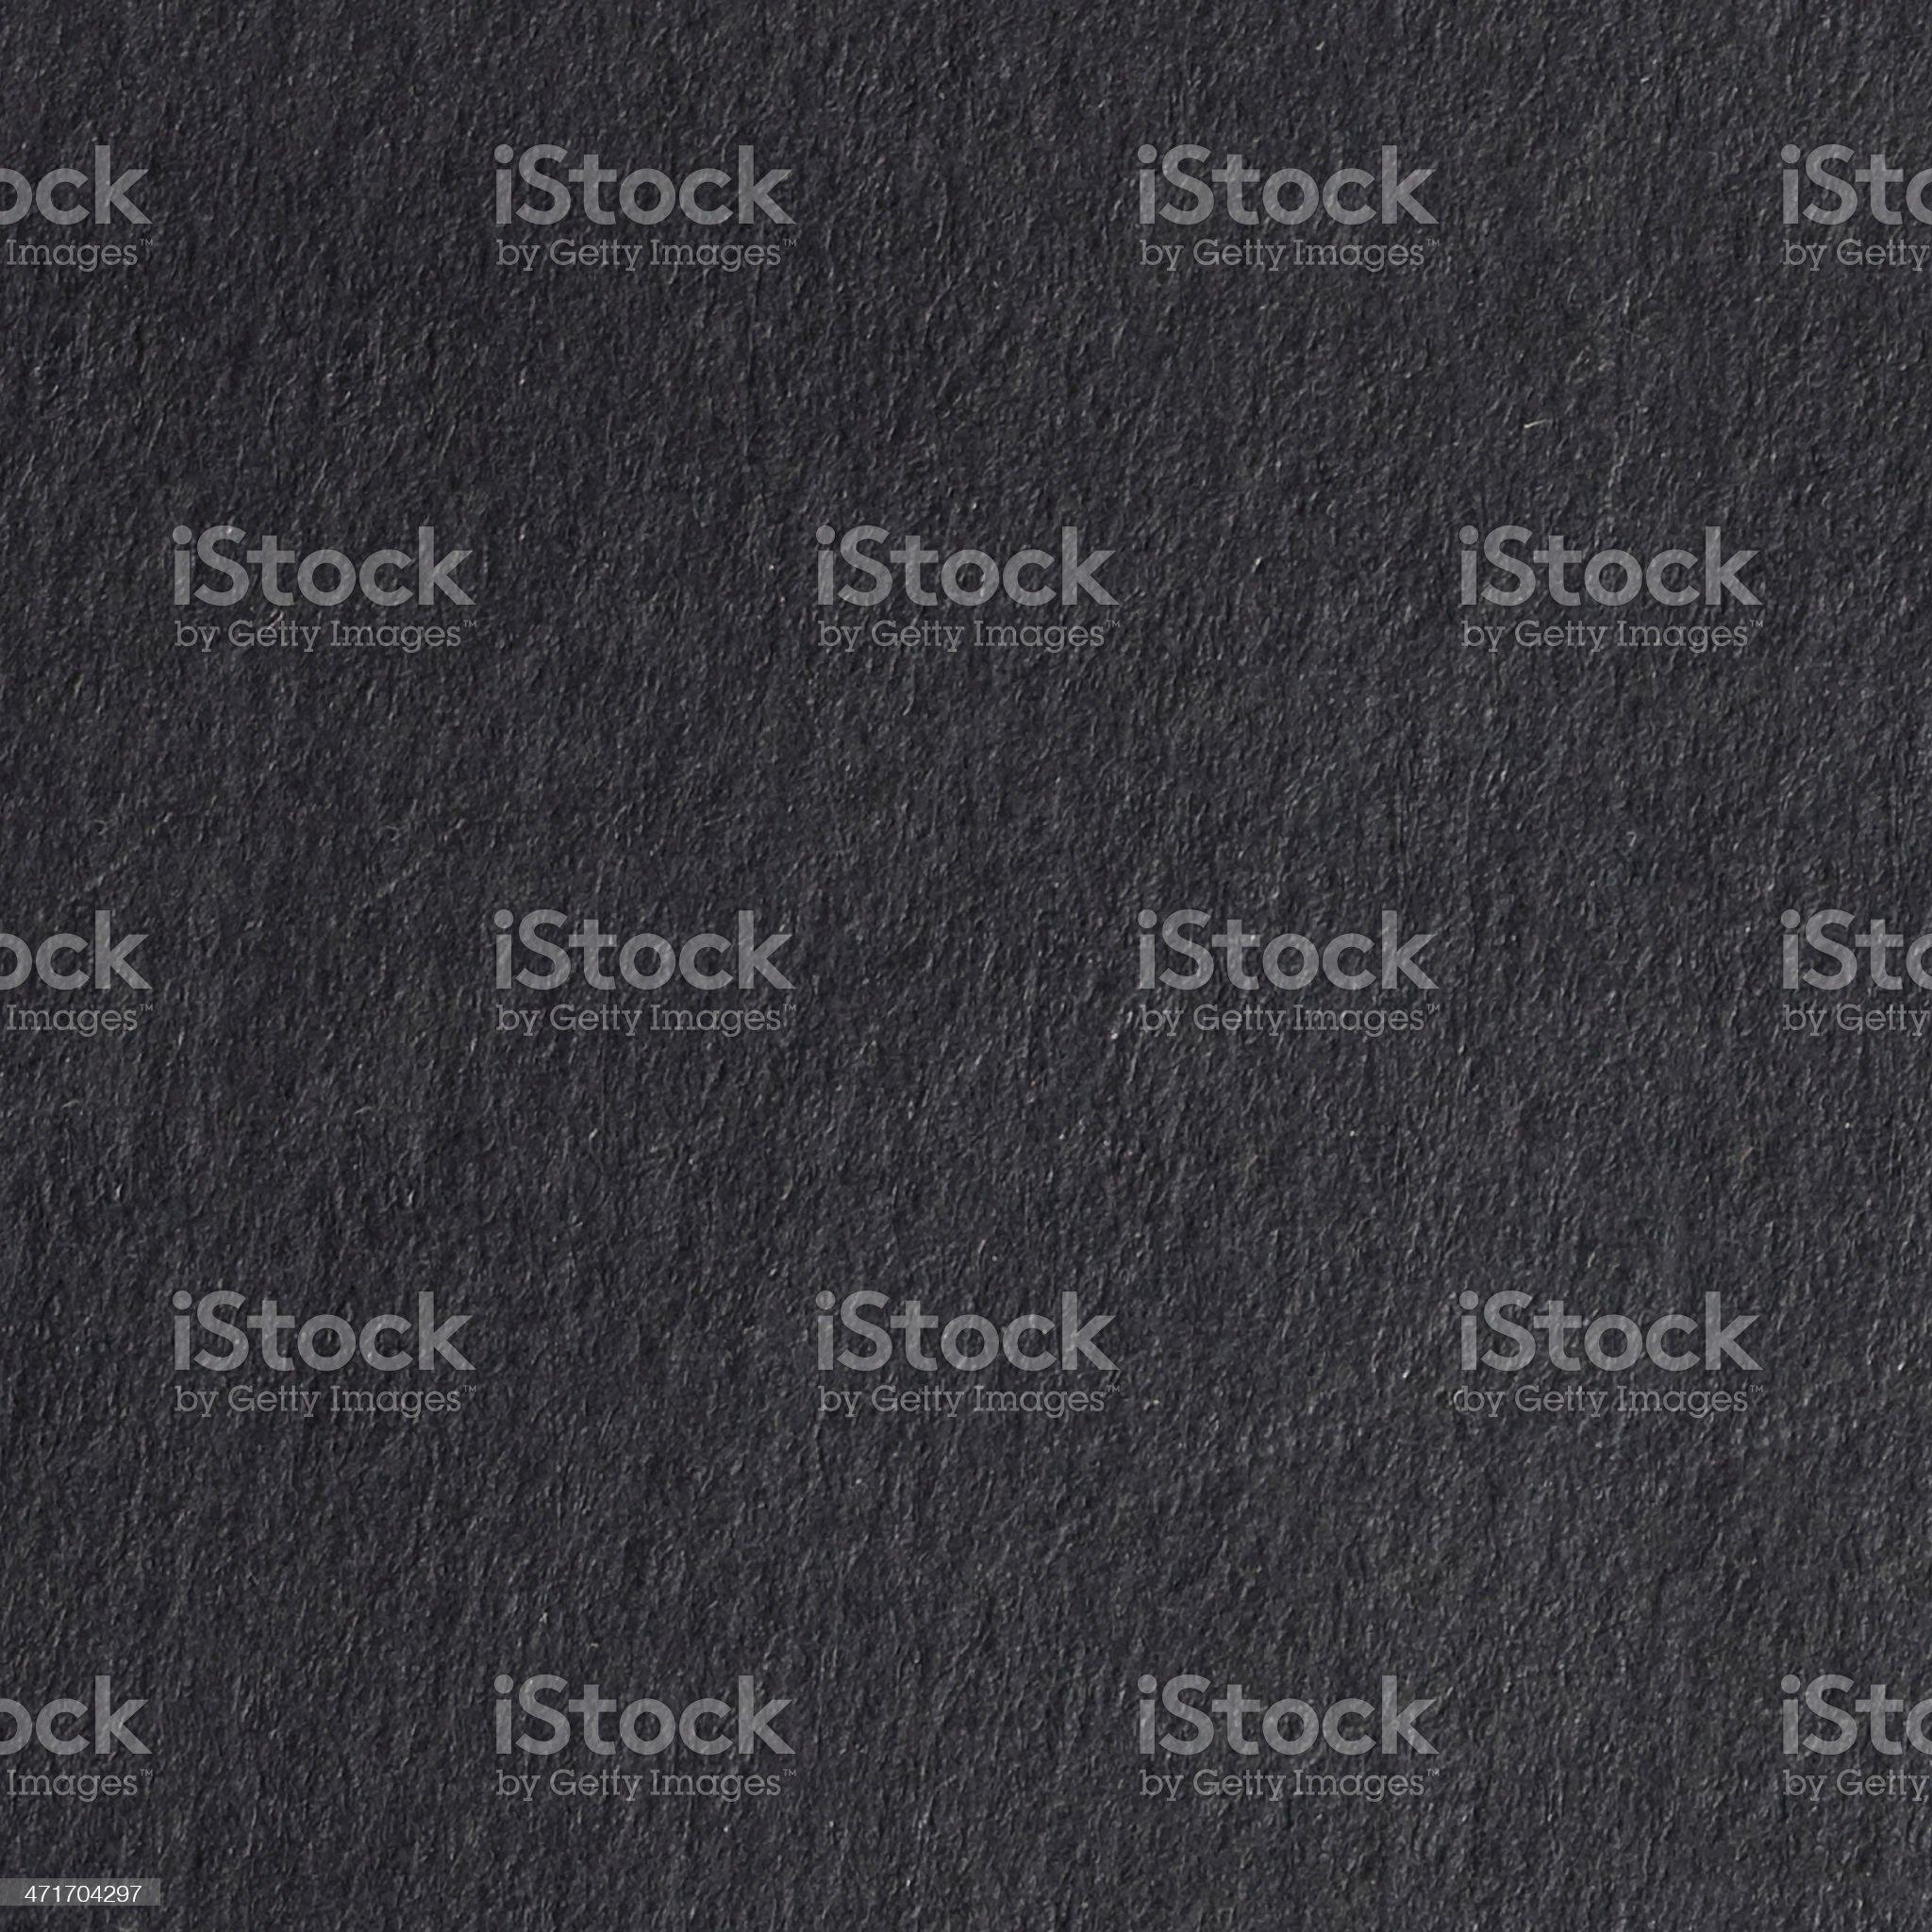 black cardboard royalty-free stock photo